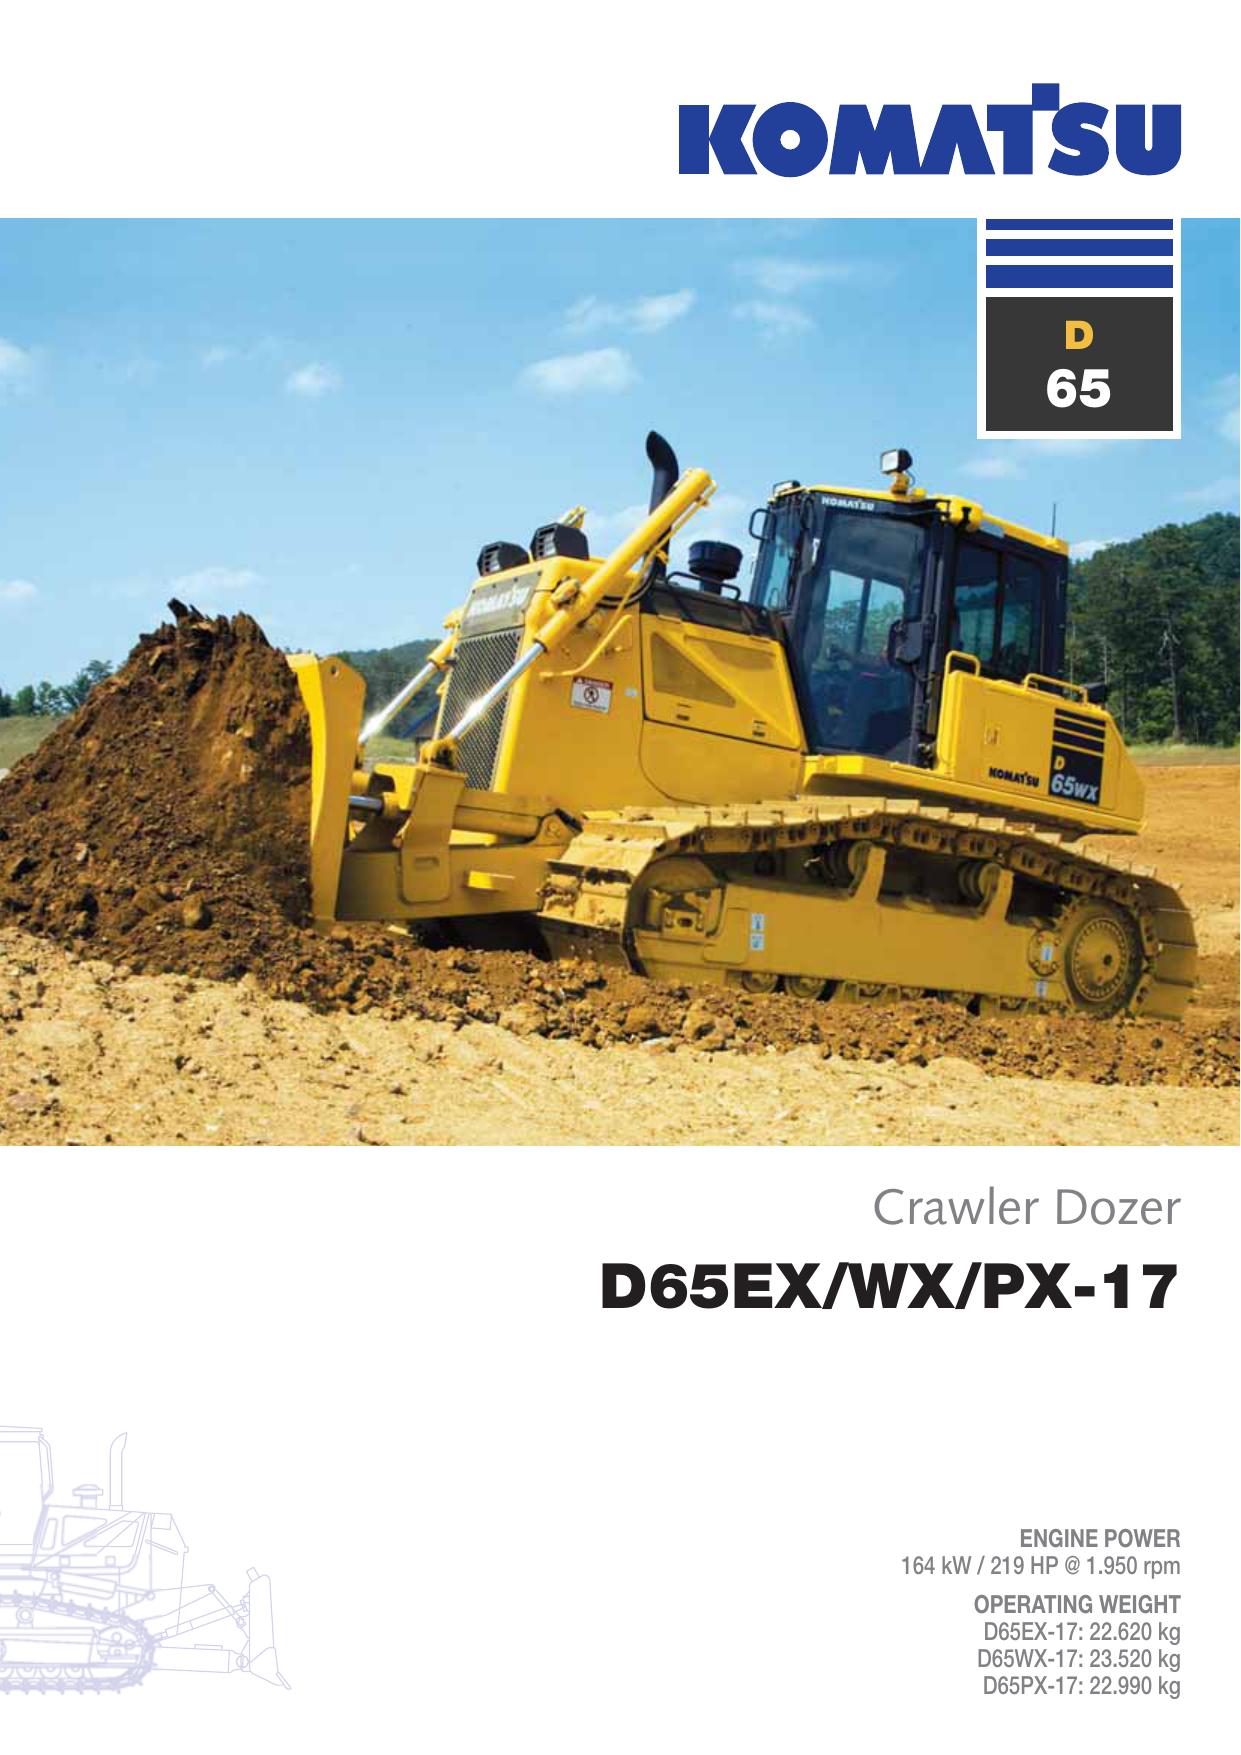 Komatsu D65-17 EX/PX/WX Bulldozer Product Brochure